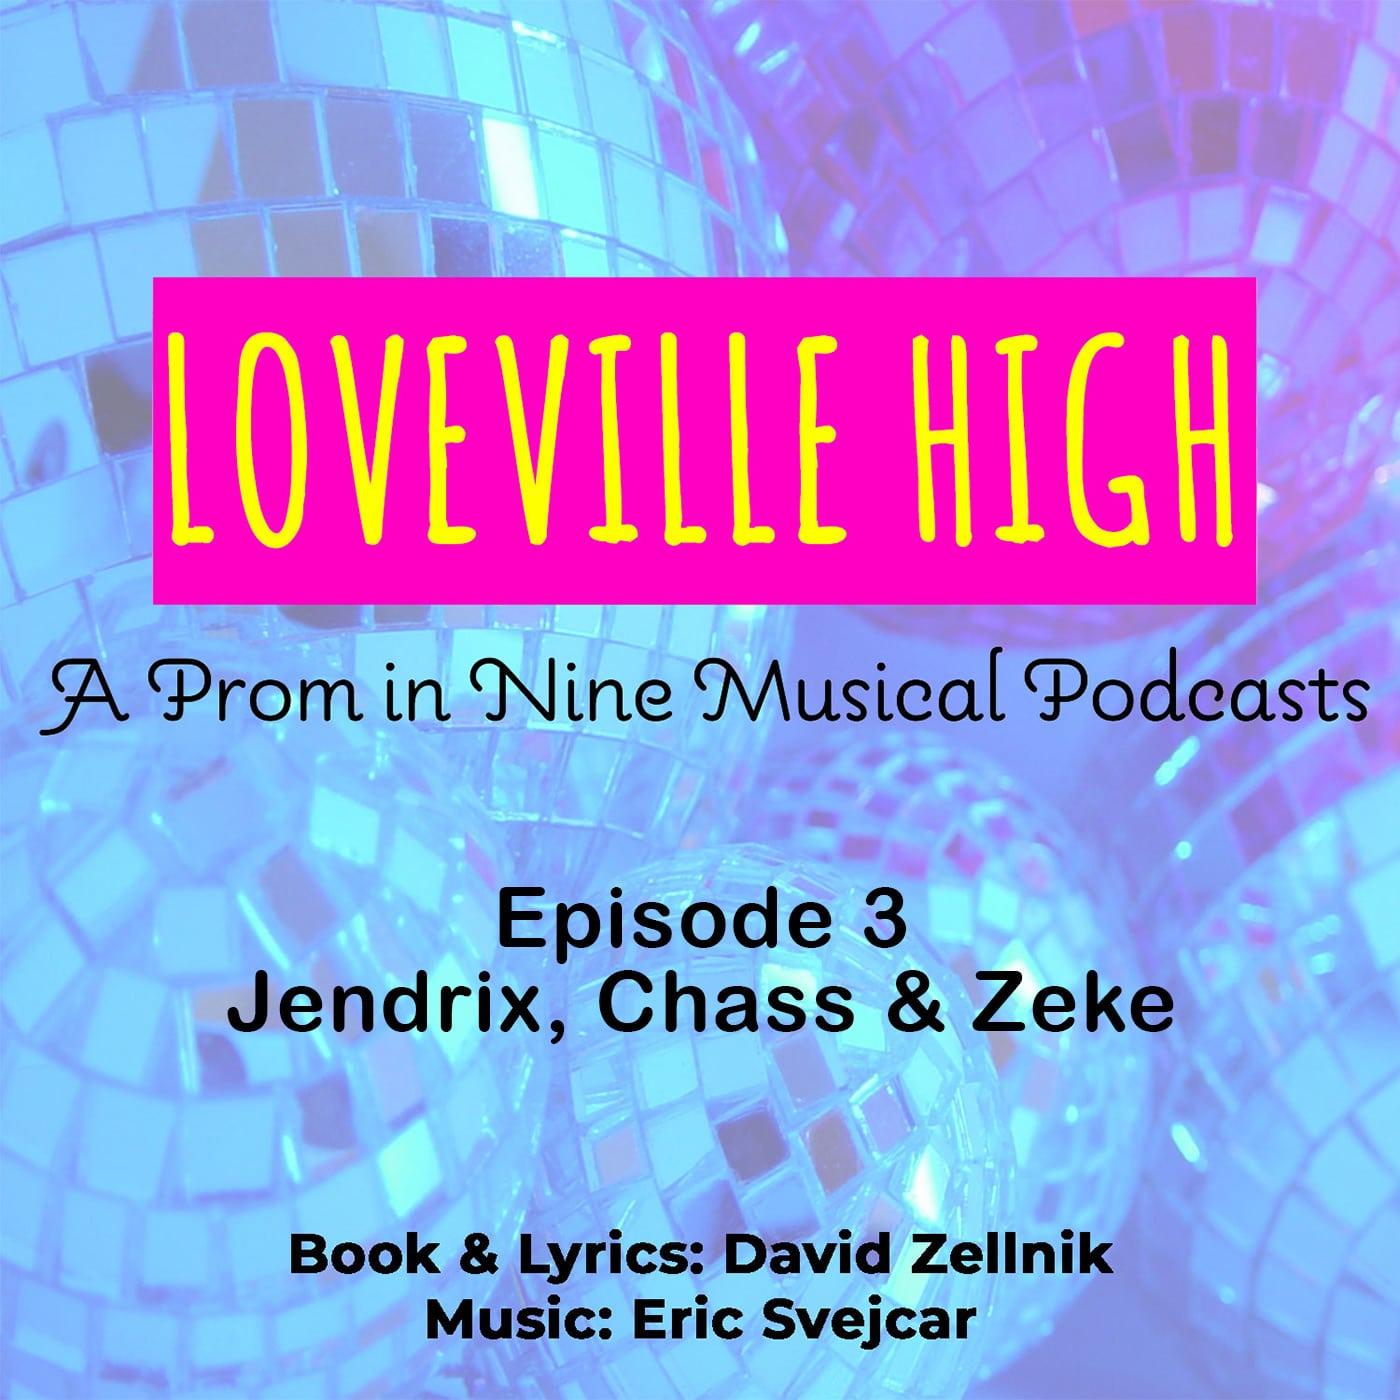 Loveville High Ep3